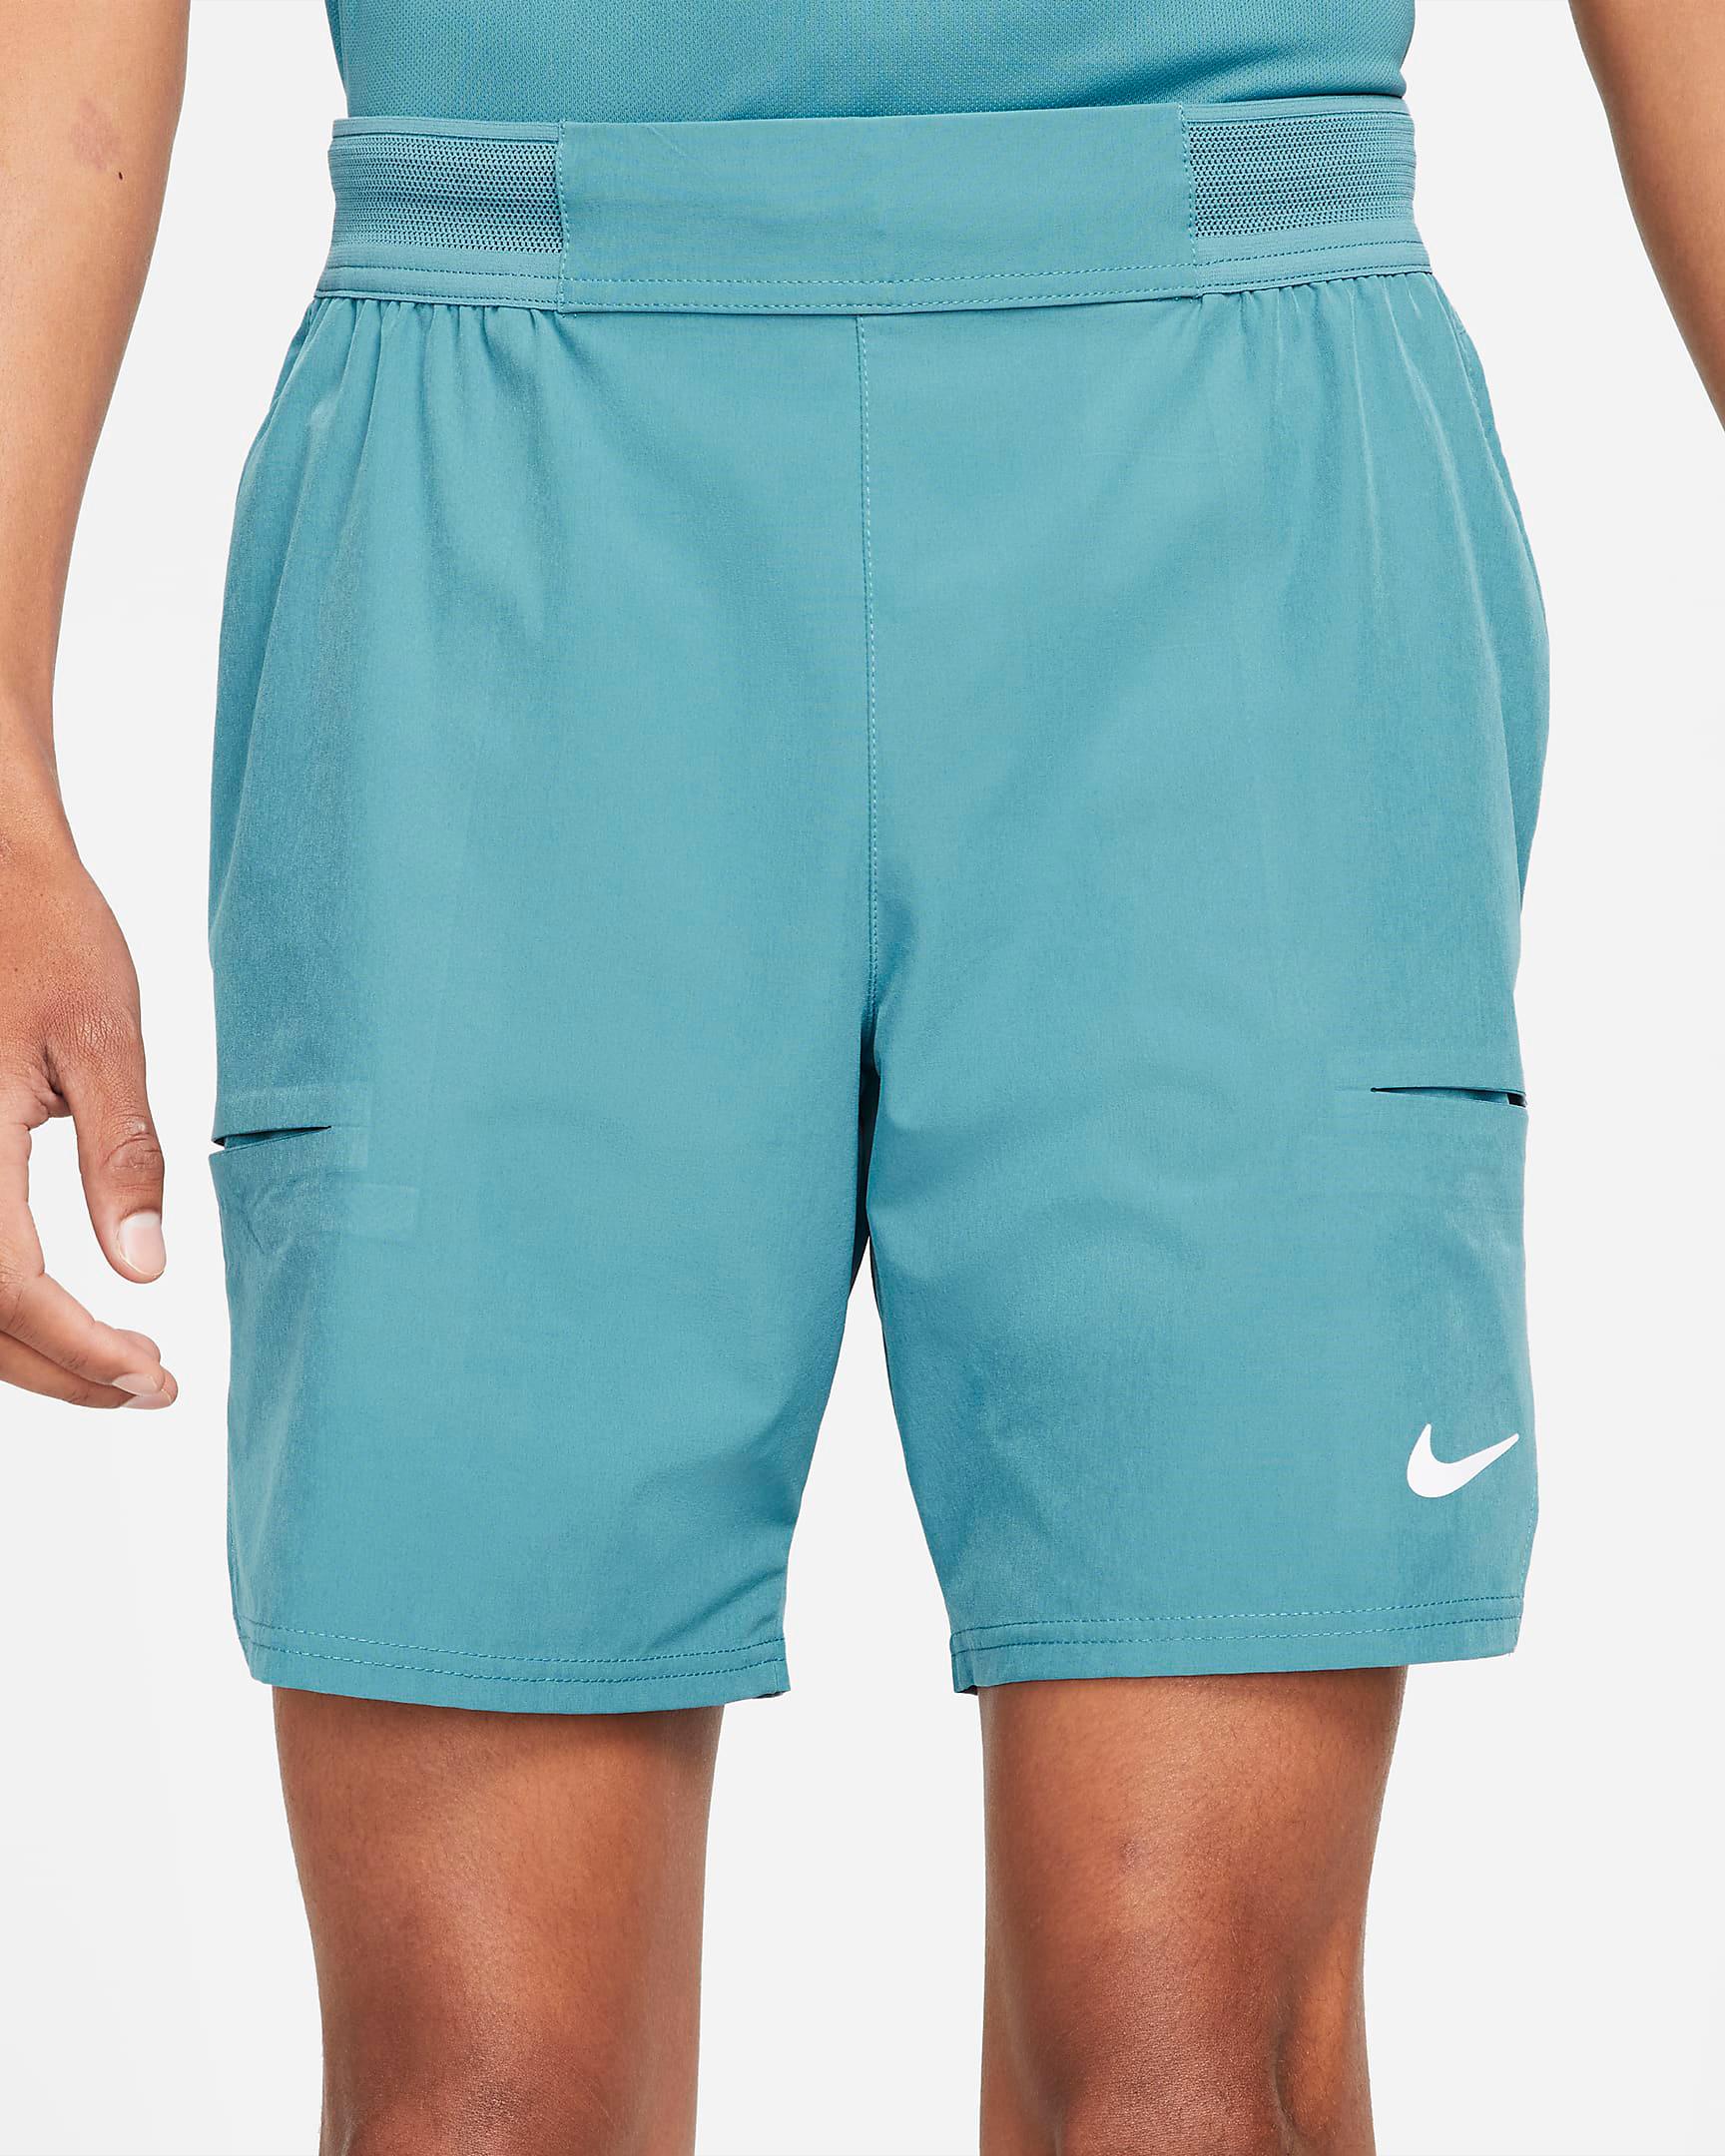 nike-rift-blue-tennis-shirt-shorts-2